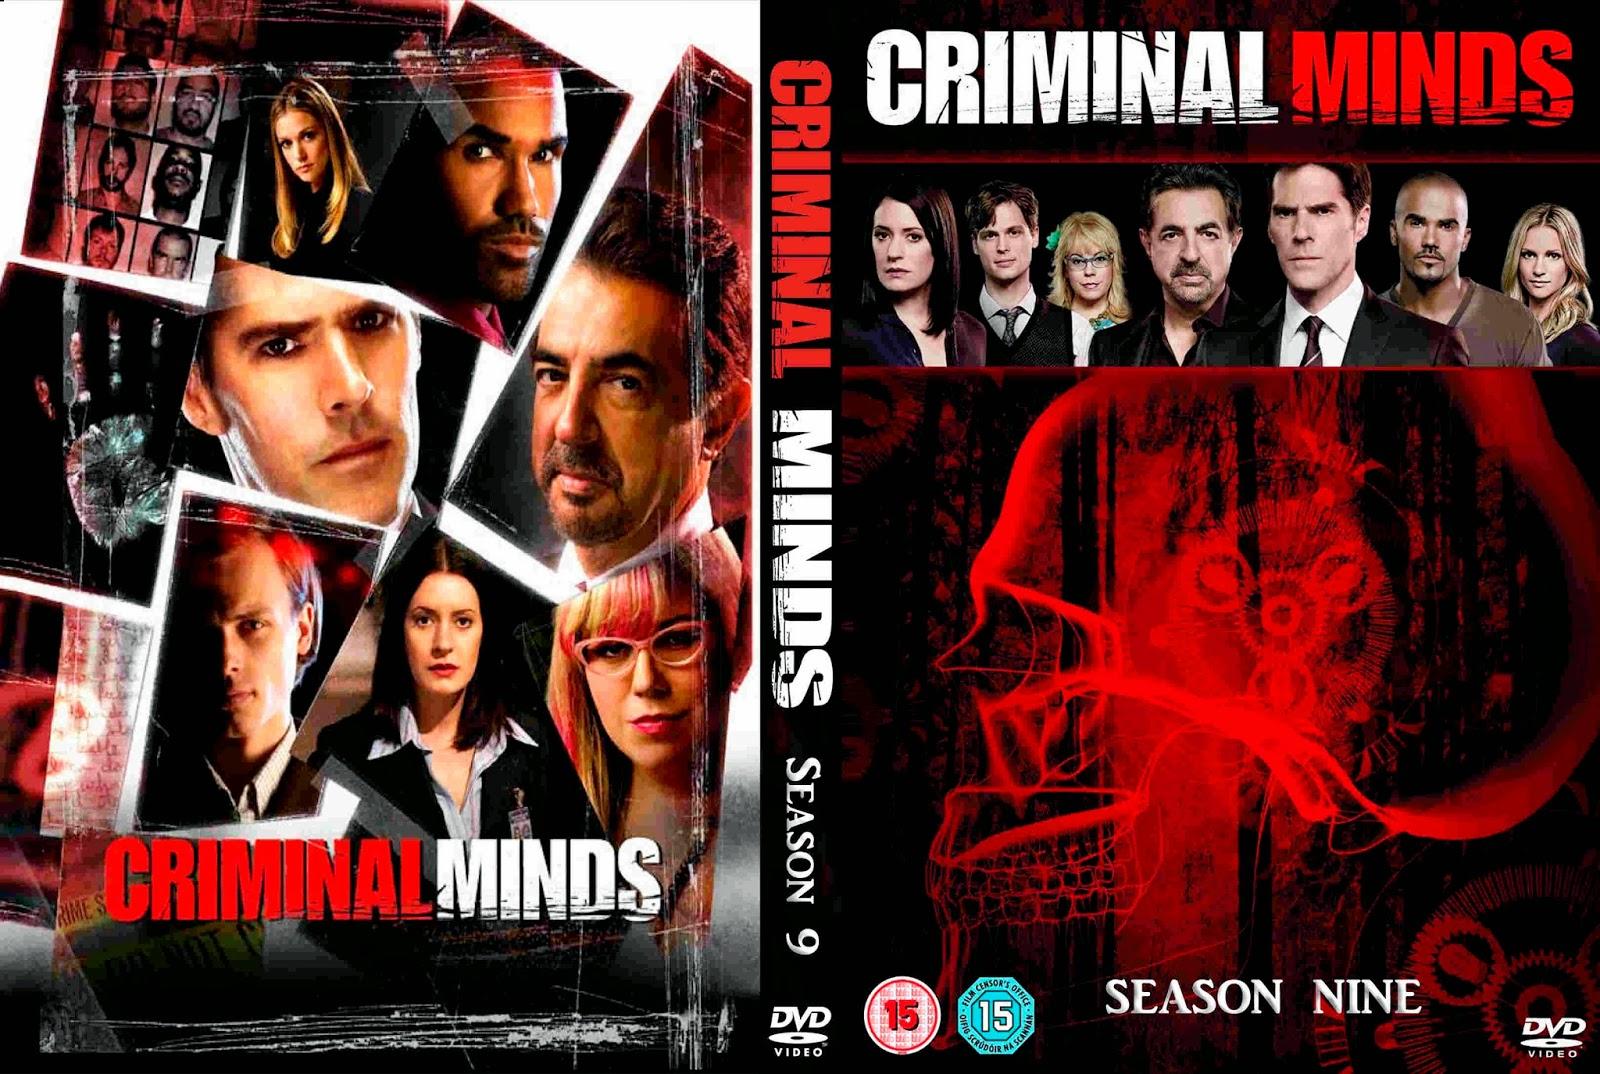 New episodes of criminal minds season 9 / Broadway pizza greenlawn menu